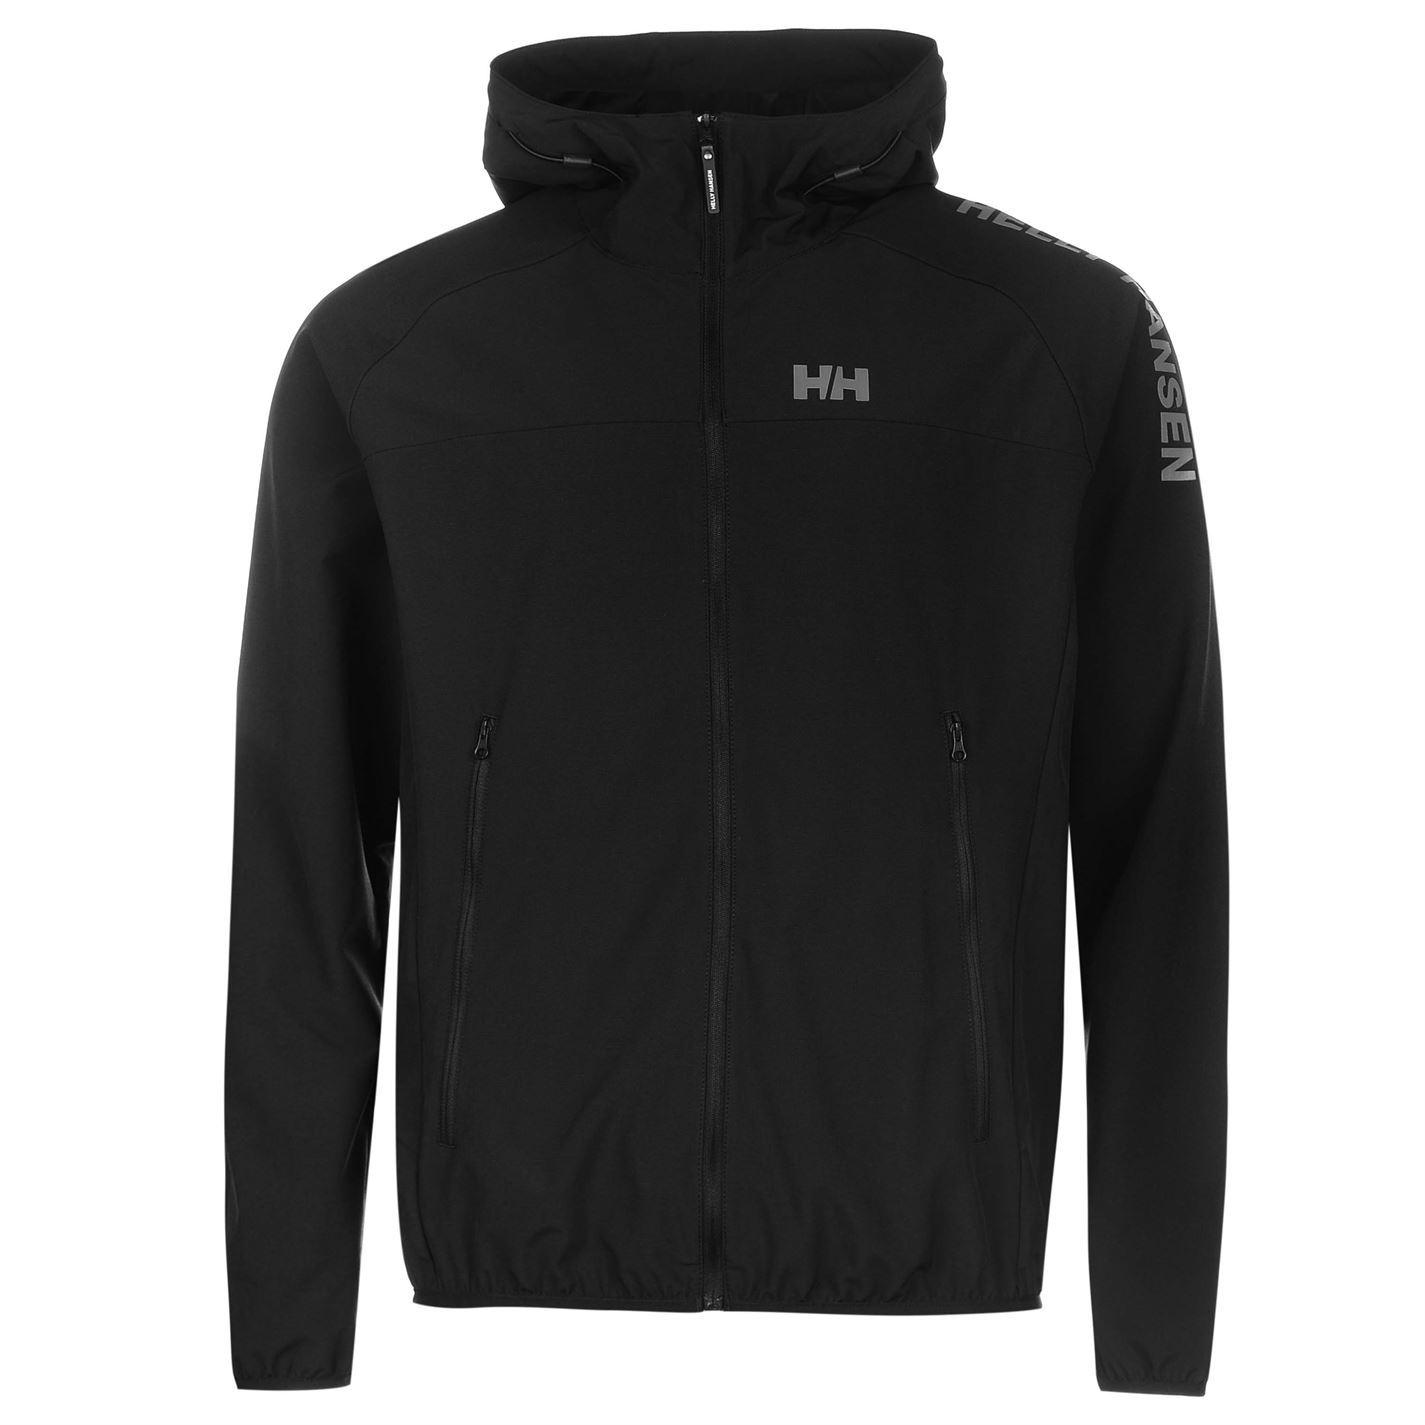 c02a7daa Image is loading Helly-Hansen-Mens-Jetty-Hooded-Softshell-Jacket-Coat-